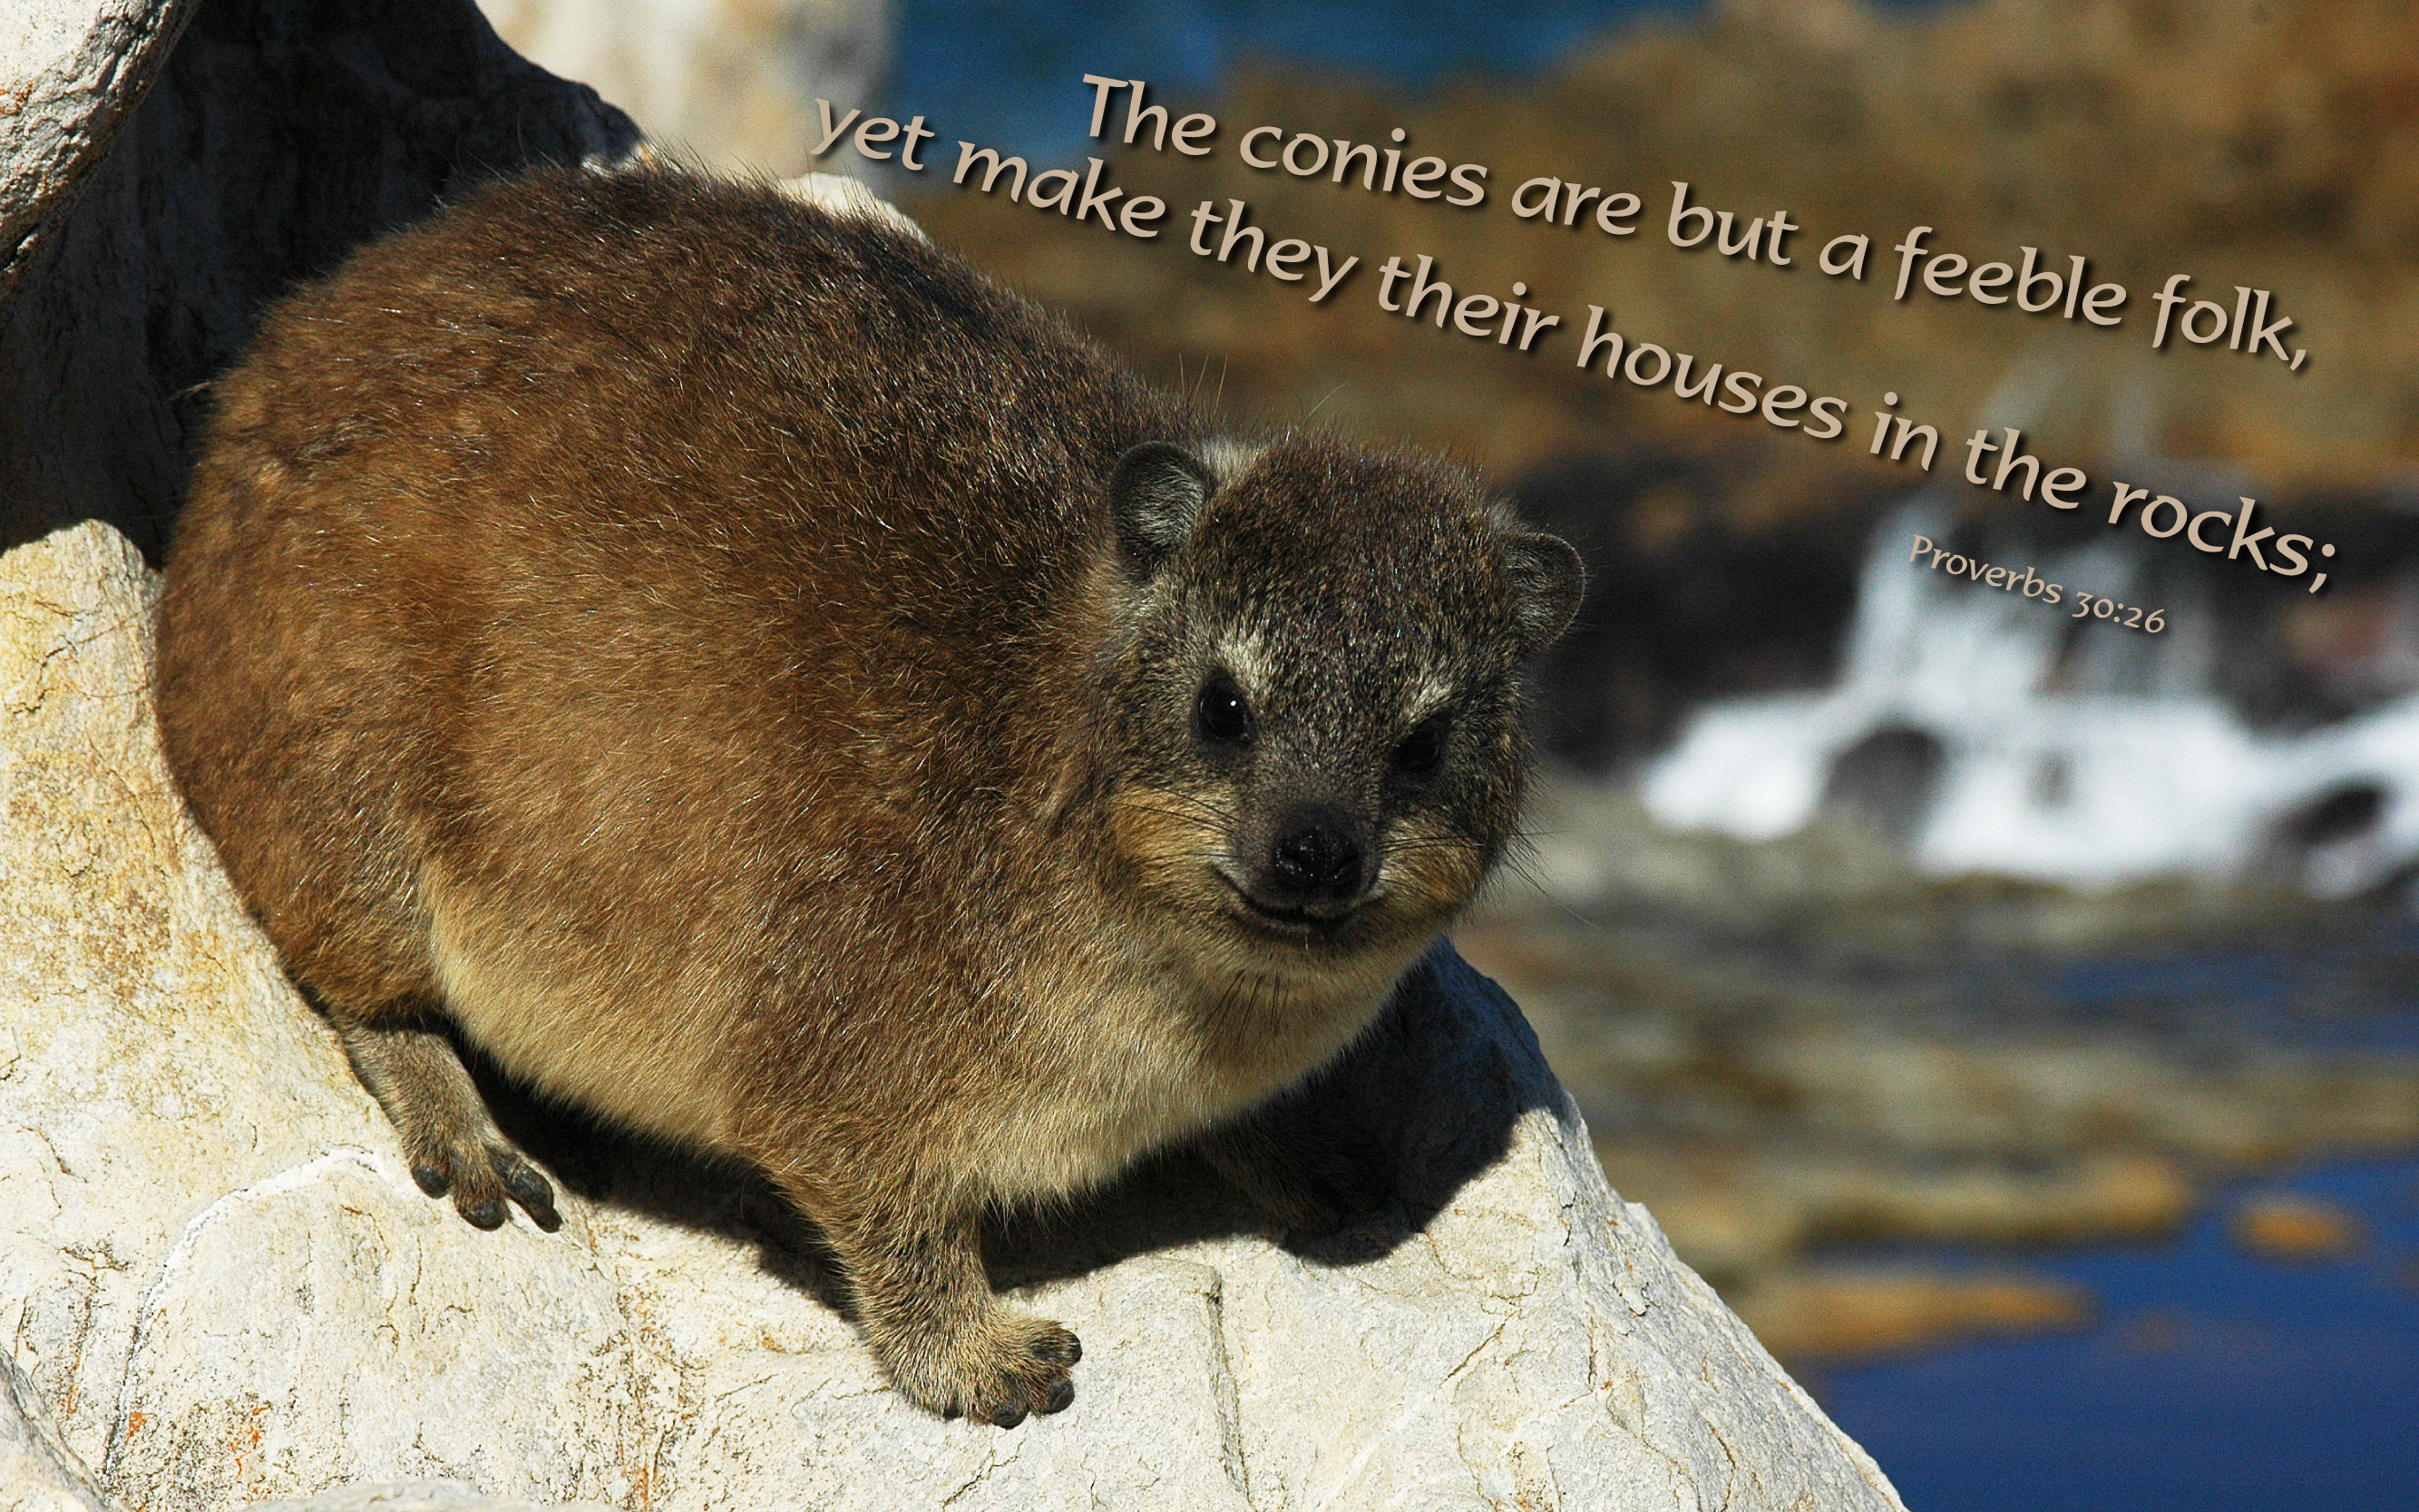 Proverbs 30:26 - Free Nature & Bible Desktop Background